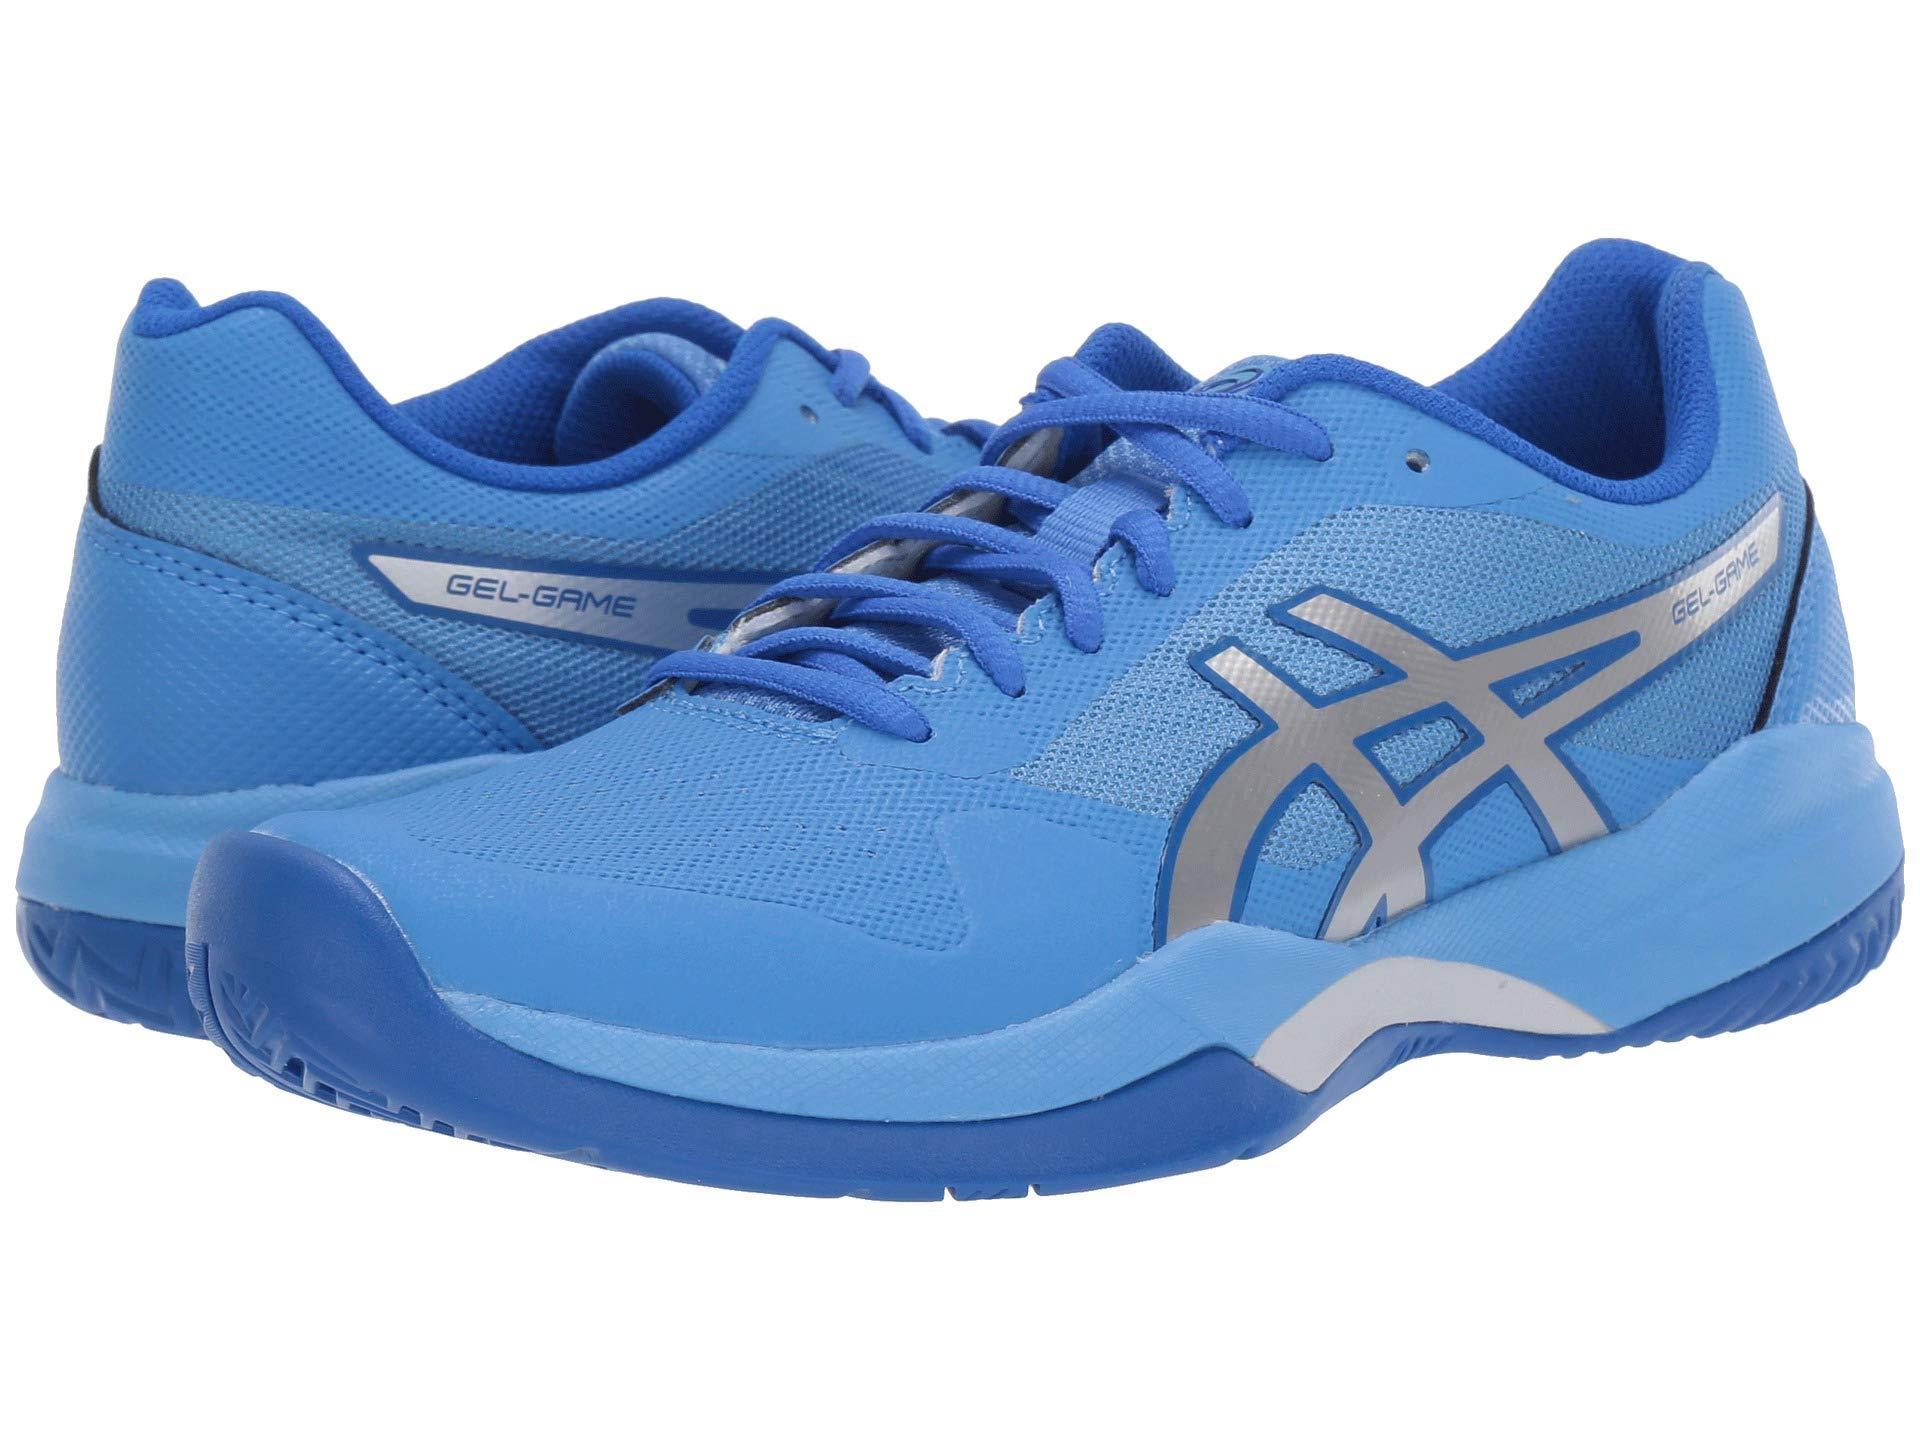 pretty nice 906d5 71dde Asics. Blue Gel-game 7 (papaya silver) Women s Tennis Shoes